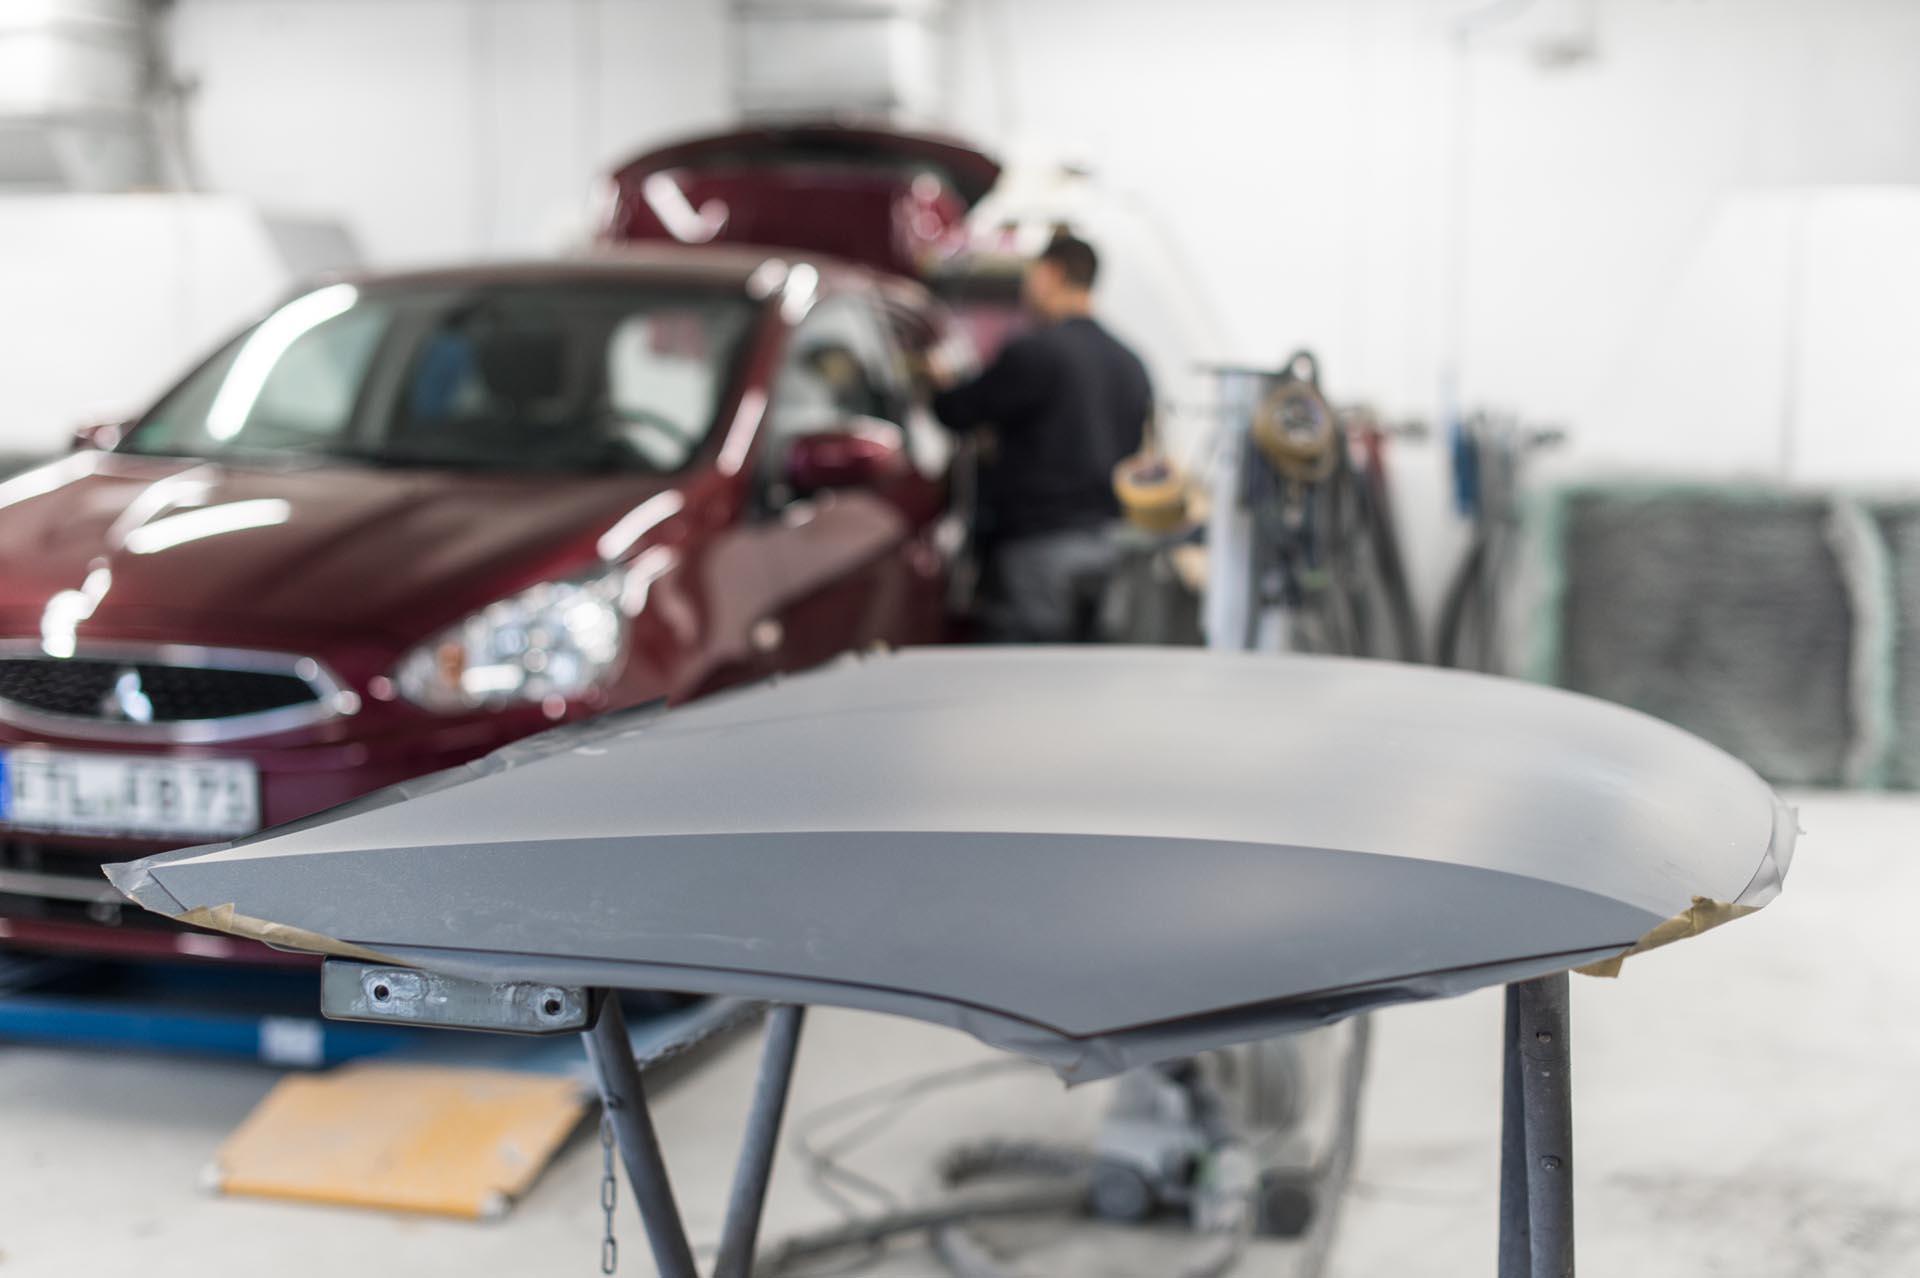 Poweleit Der Autolackierer GmbH | Leistung | Fahrzeuglackierung